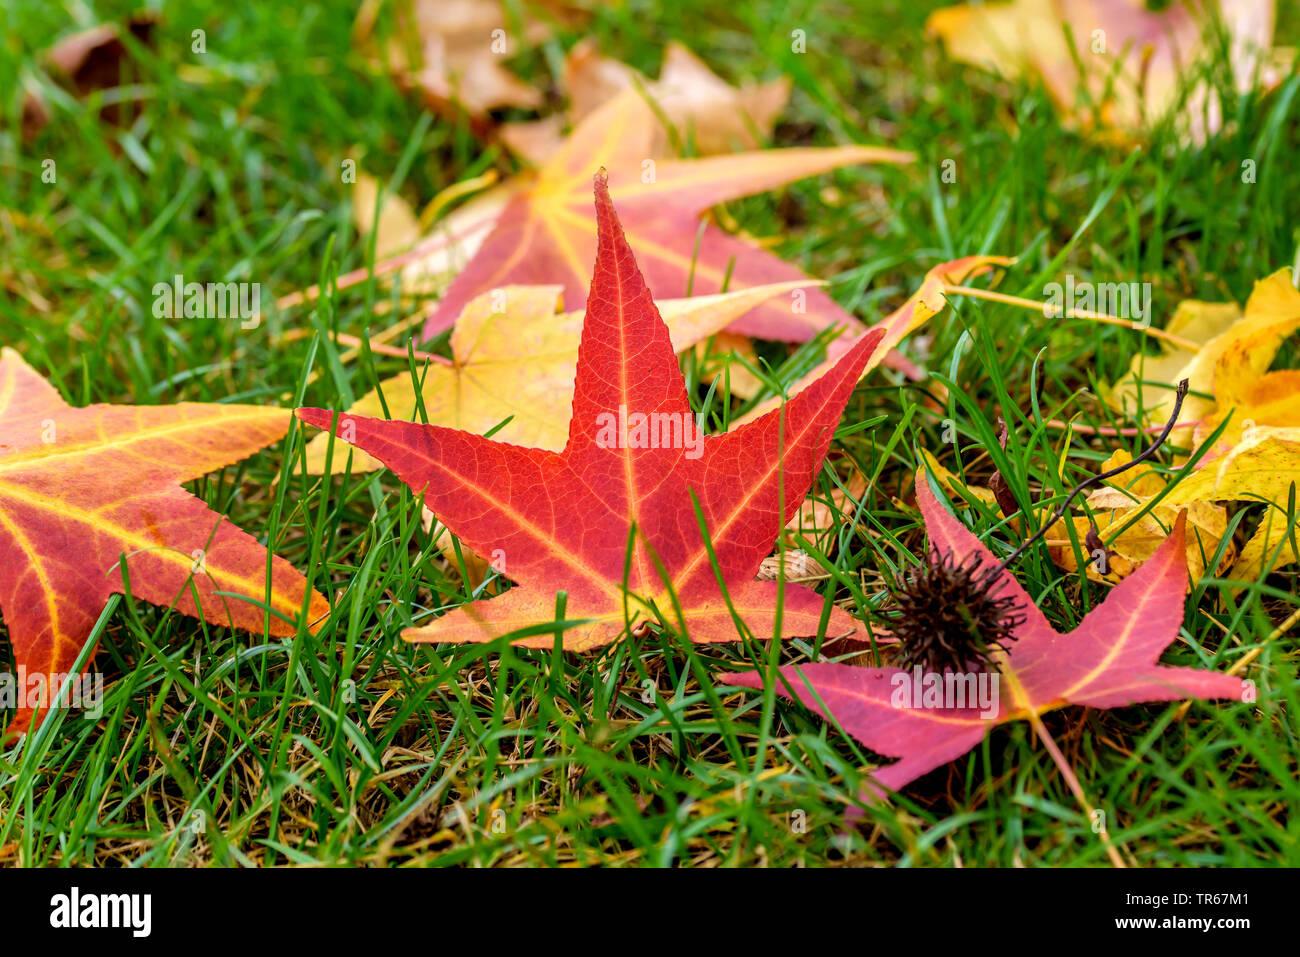 Satin Walnut, Sweet Gum, Red Gum (Liquidambar styraciflua), autumn leaves on a lawn, Germany - Stock Image